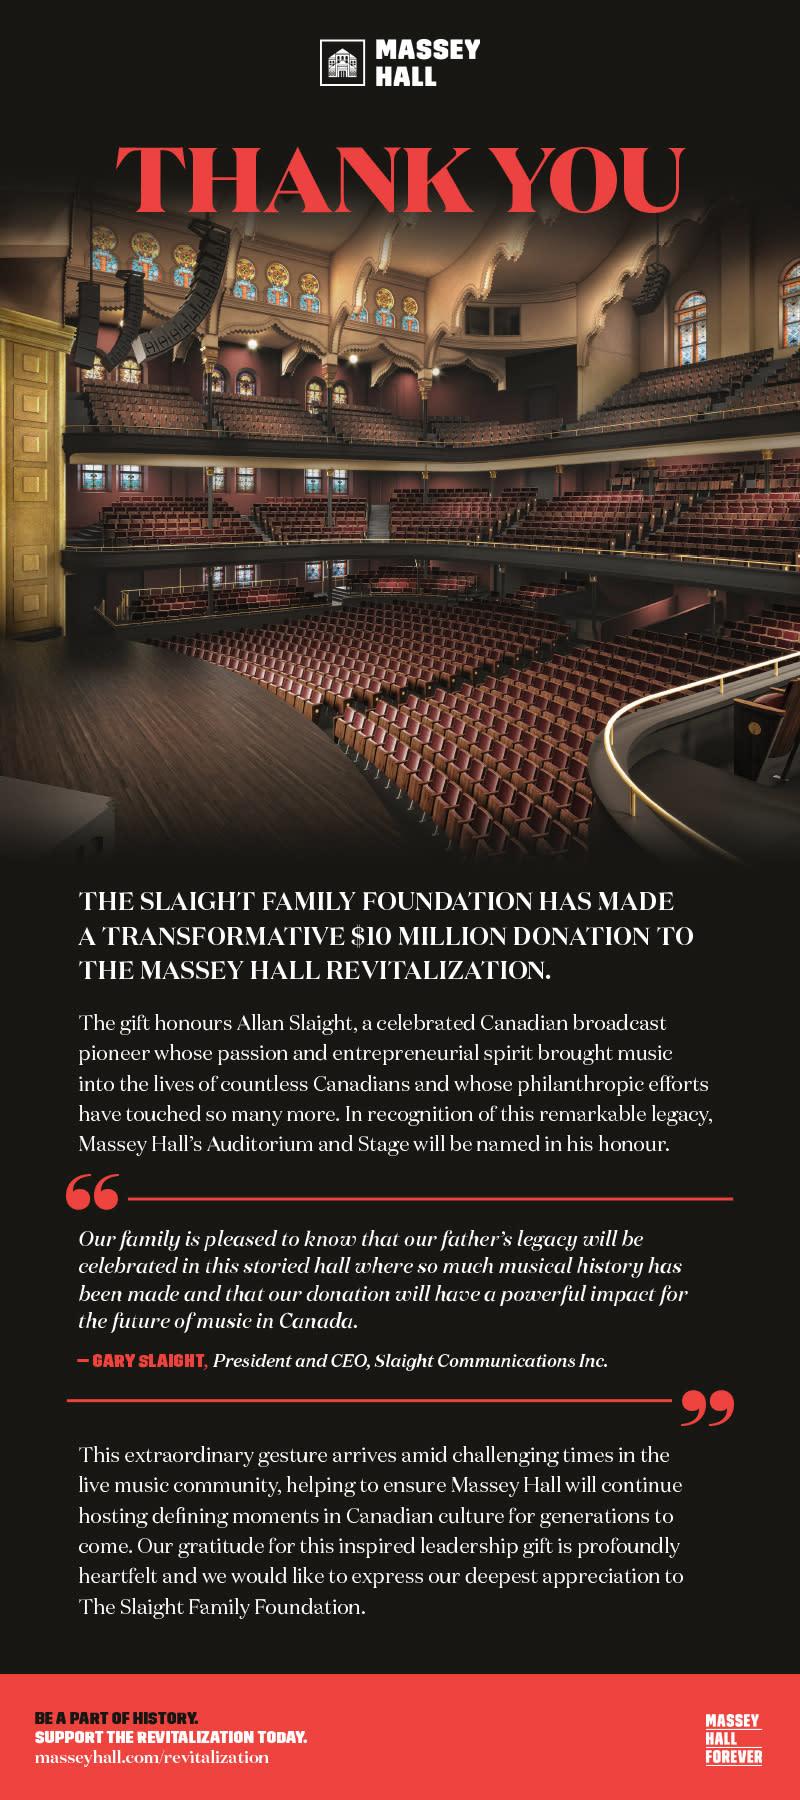 The Slaight Family Foundation has made a transformative $10 million donation to the Massey Hall Revitalization.